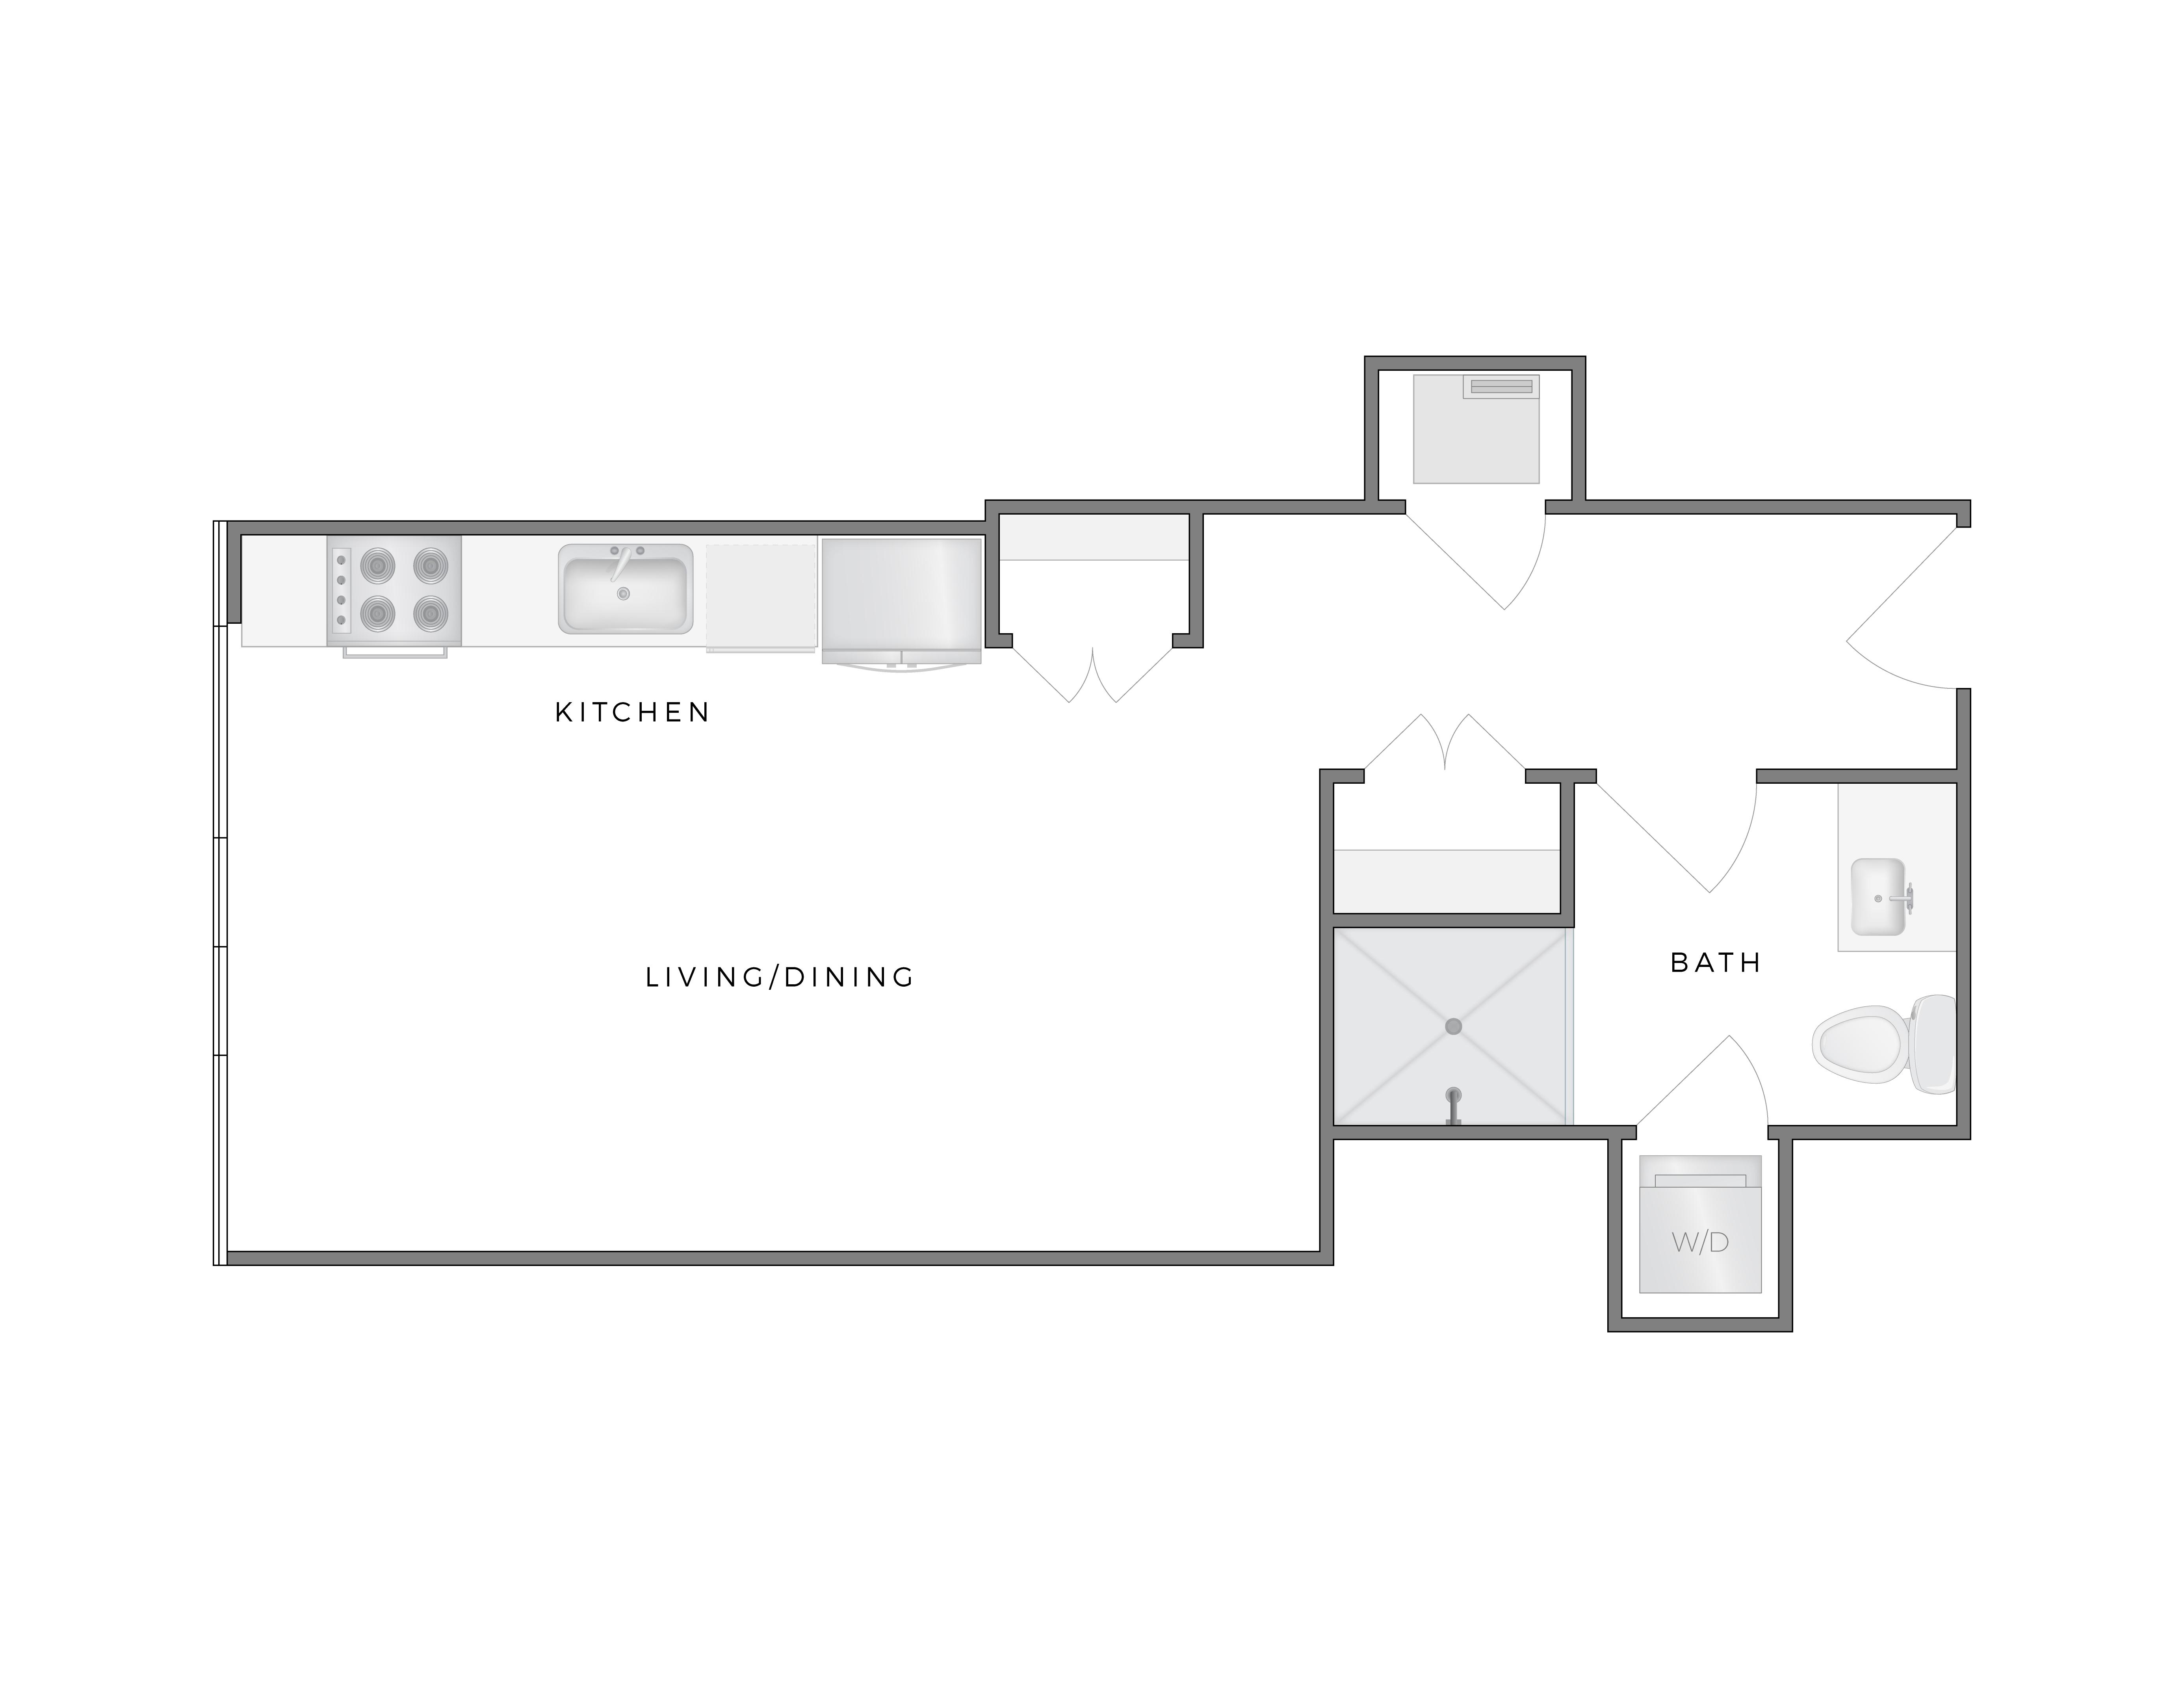 Stella studio apartment floorplan diagram at Atelier DTLA